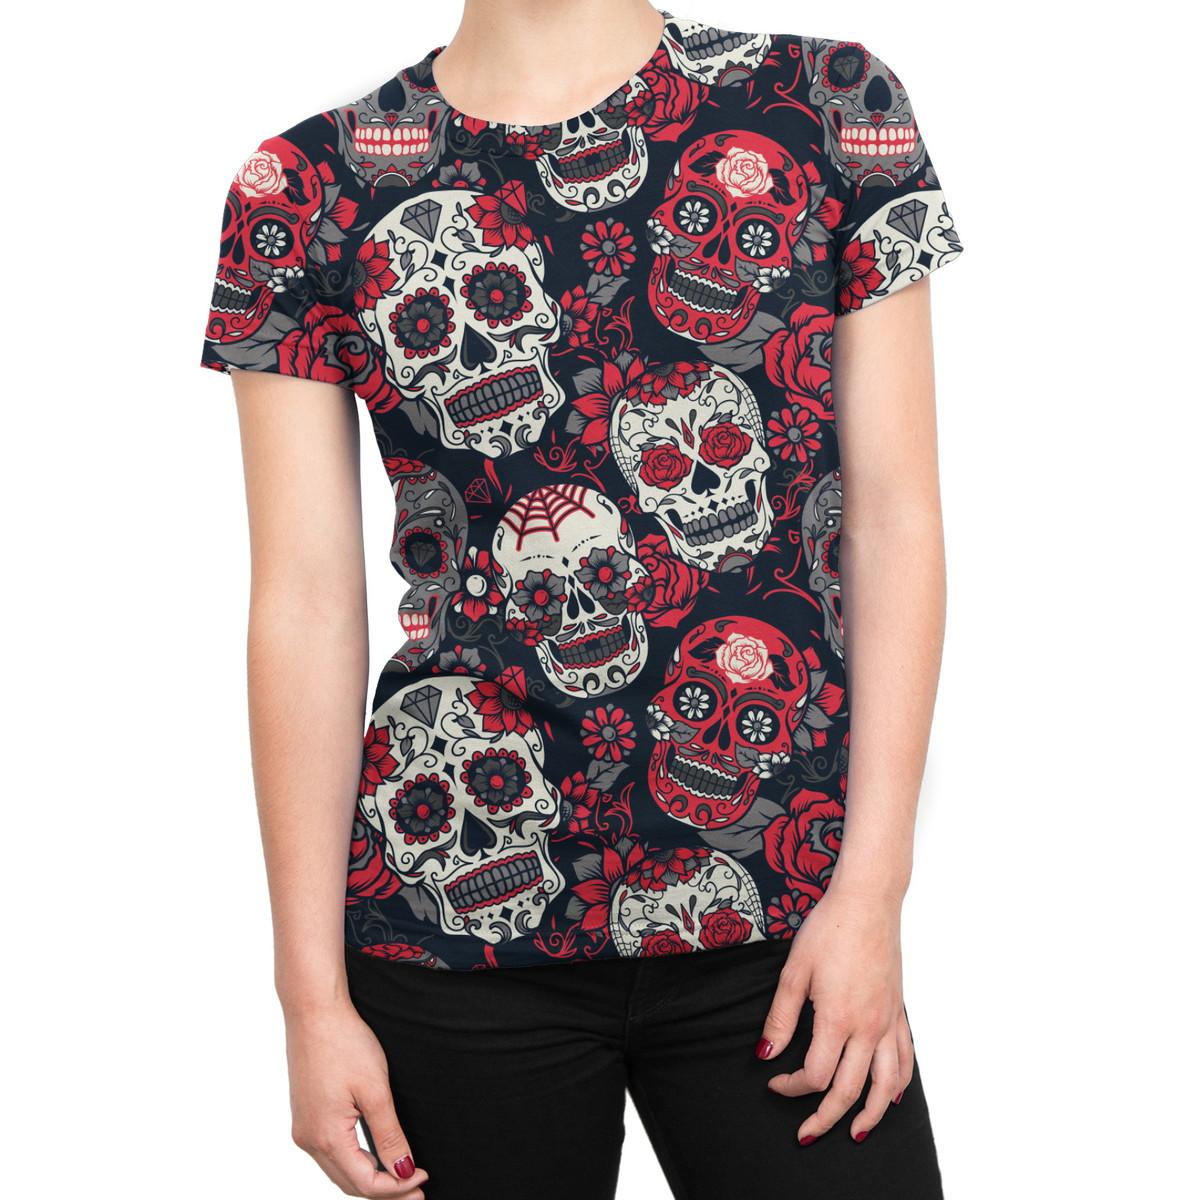 f8d5b3635 Camiseta Baby Look Feminina Caveiras Mexicanas Estampa Total no Elo7 ...